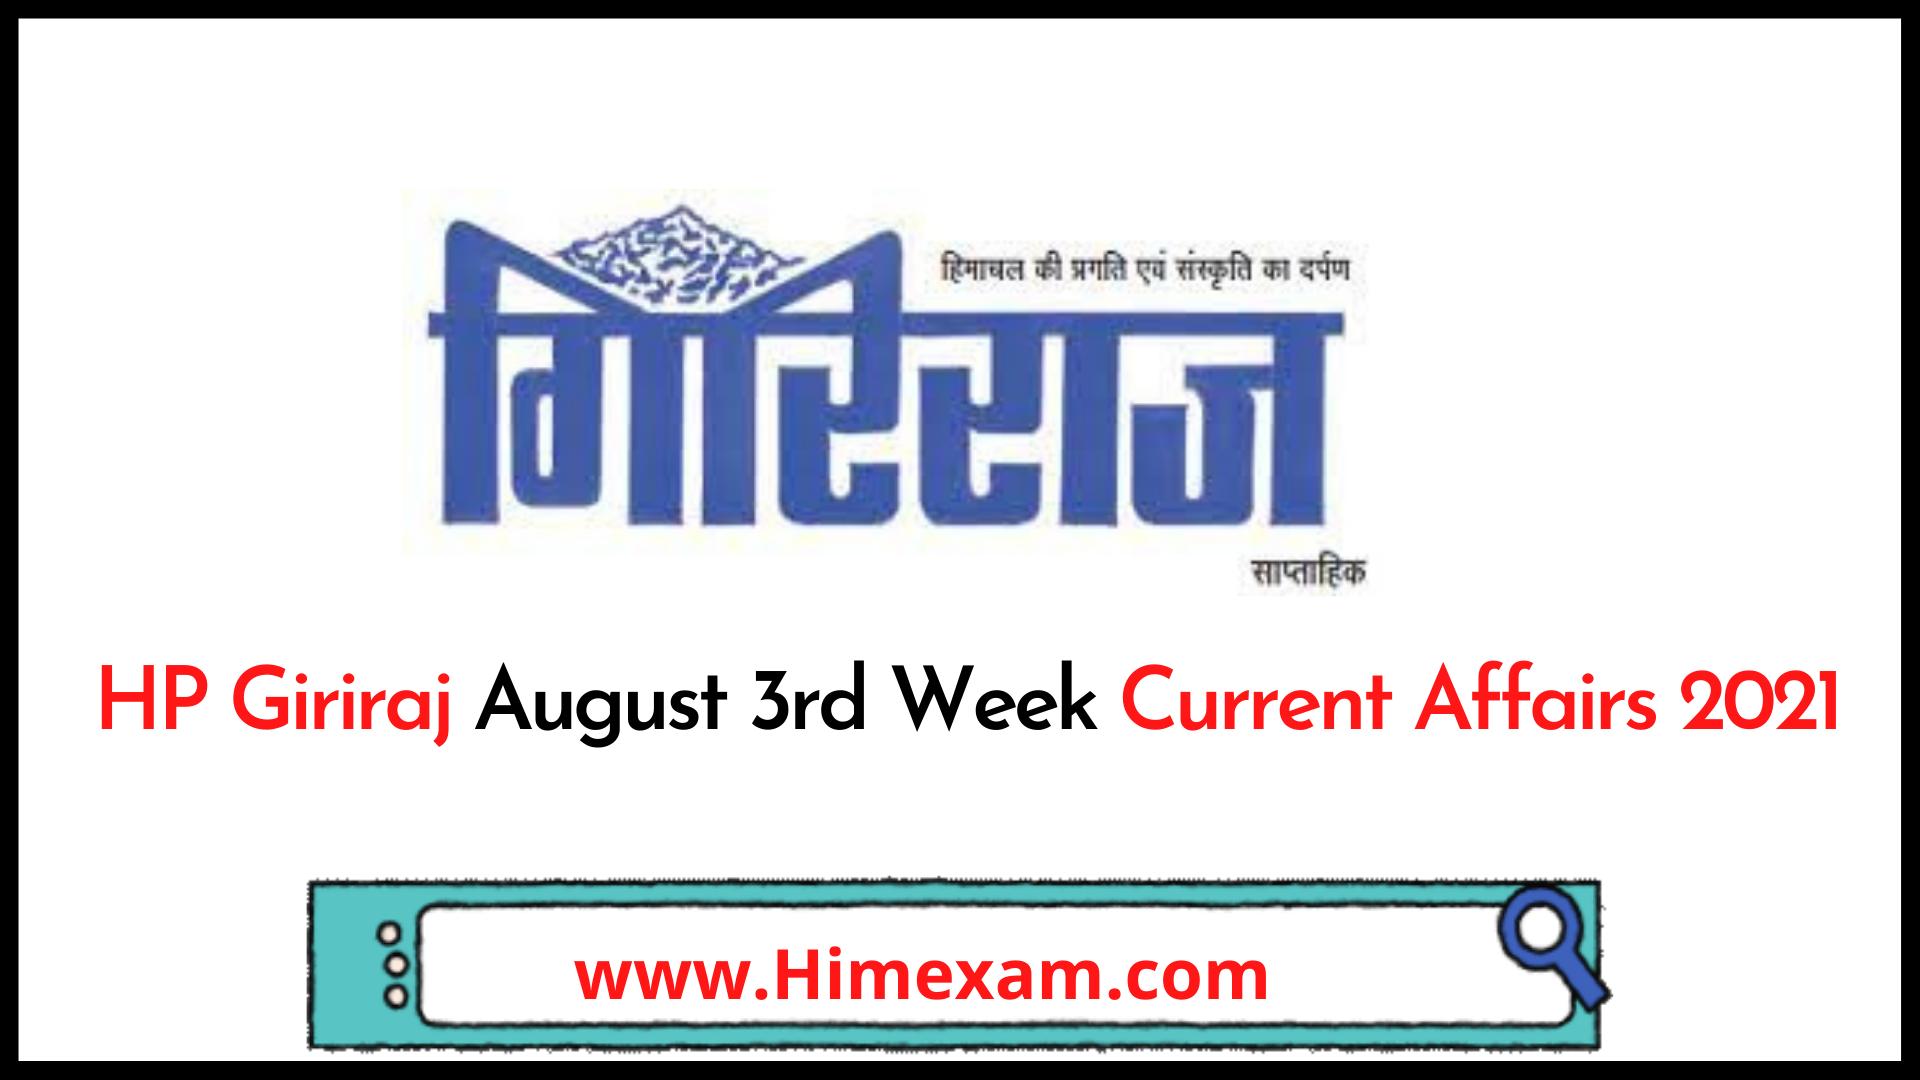 HP Giriraj August 3rd Week Current Affairs 2021